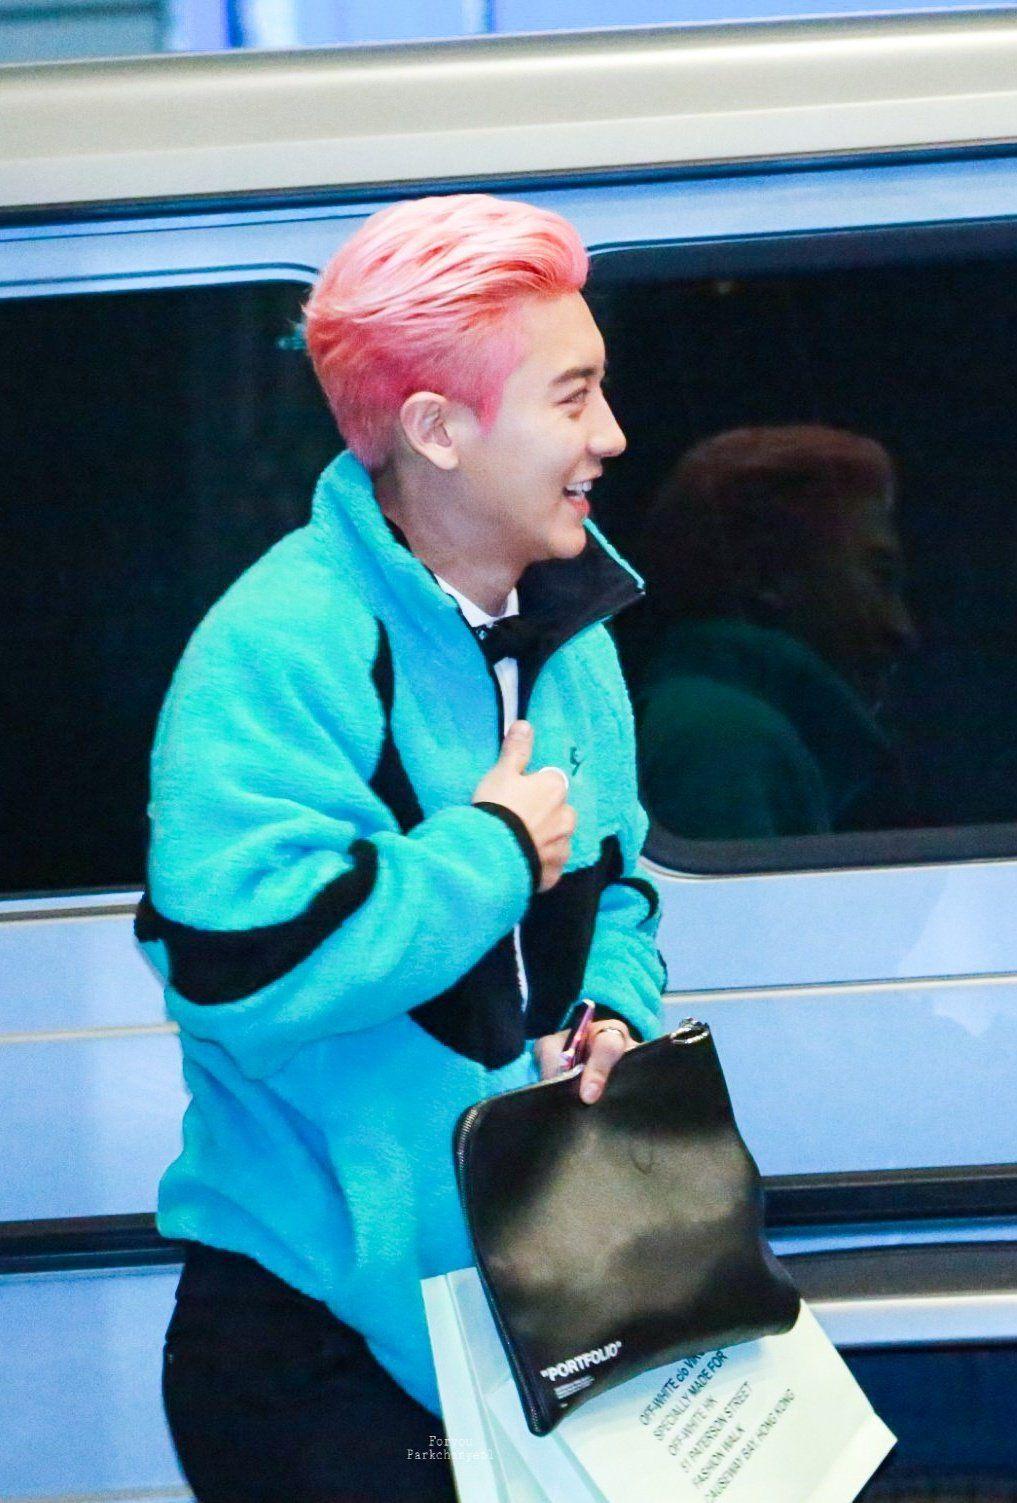 Chanyeol [HQ] 191126 Heading to Birthday Party EXO Exo